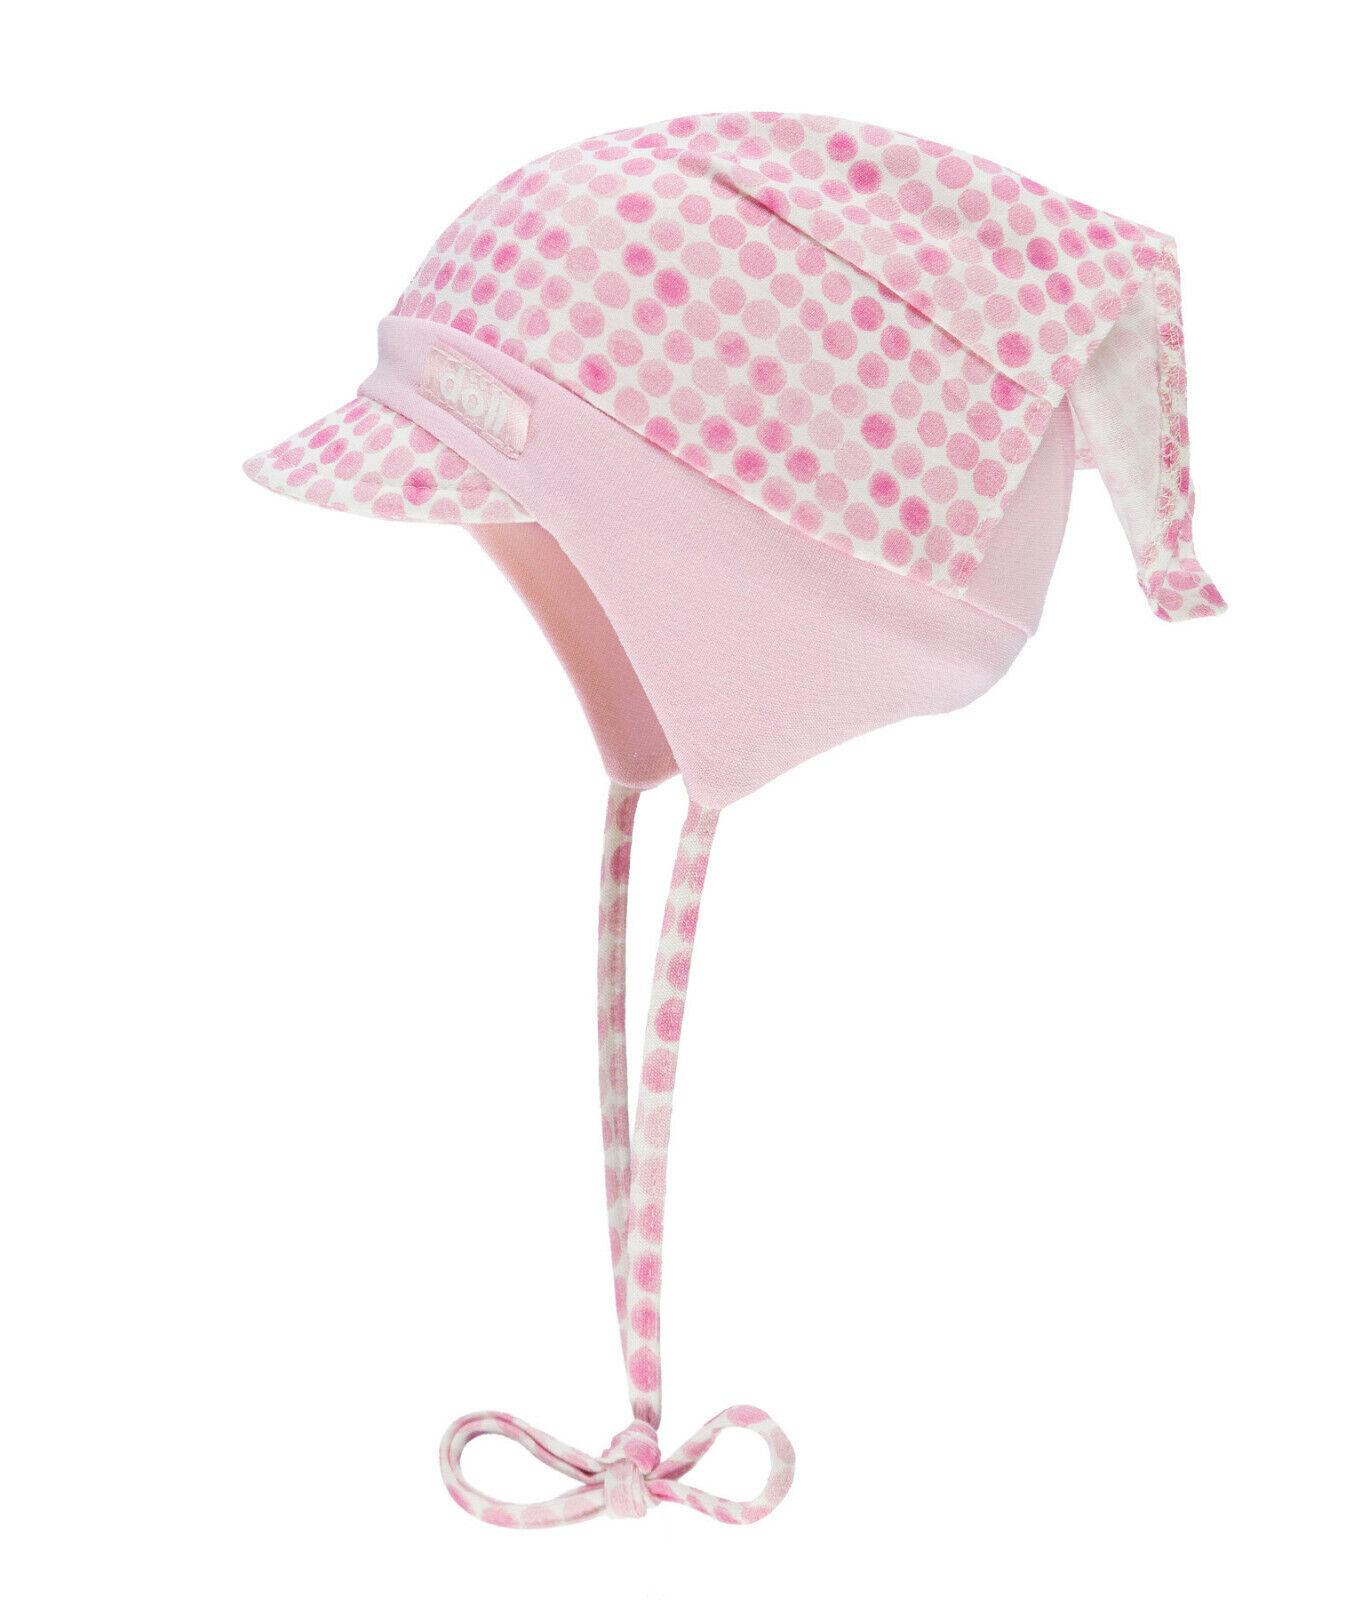 Döll Dolli Hut Mädchen Baby Mütze Babyhut Babymütze Sonnenhut UV Schutz 30 NEU